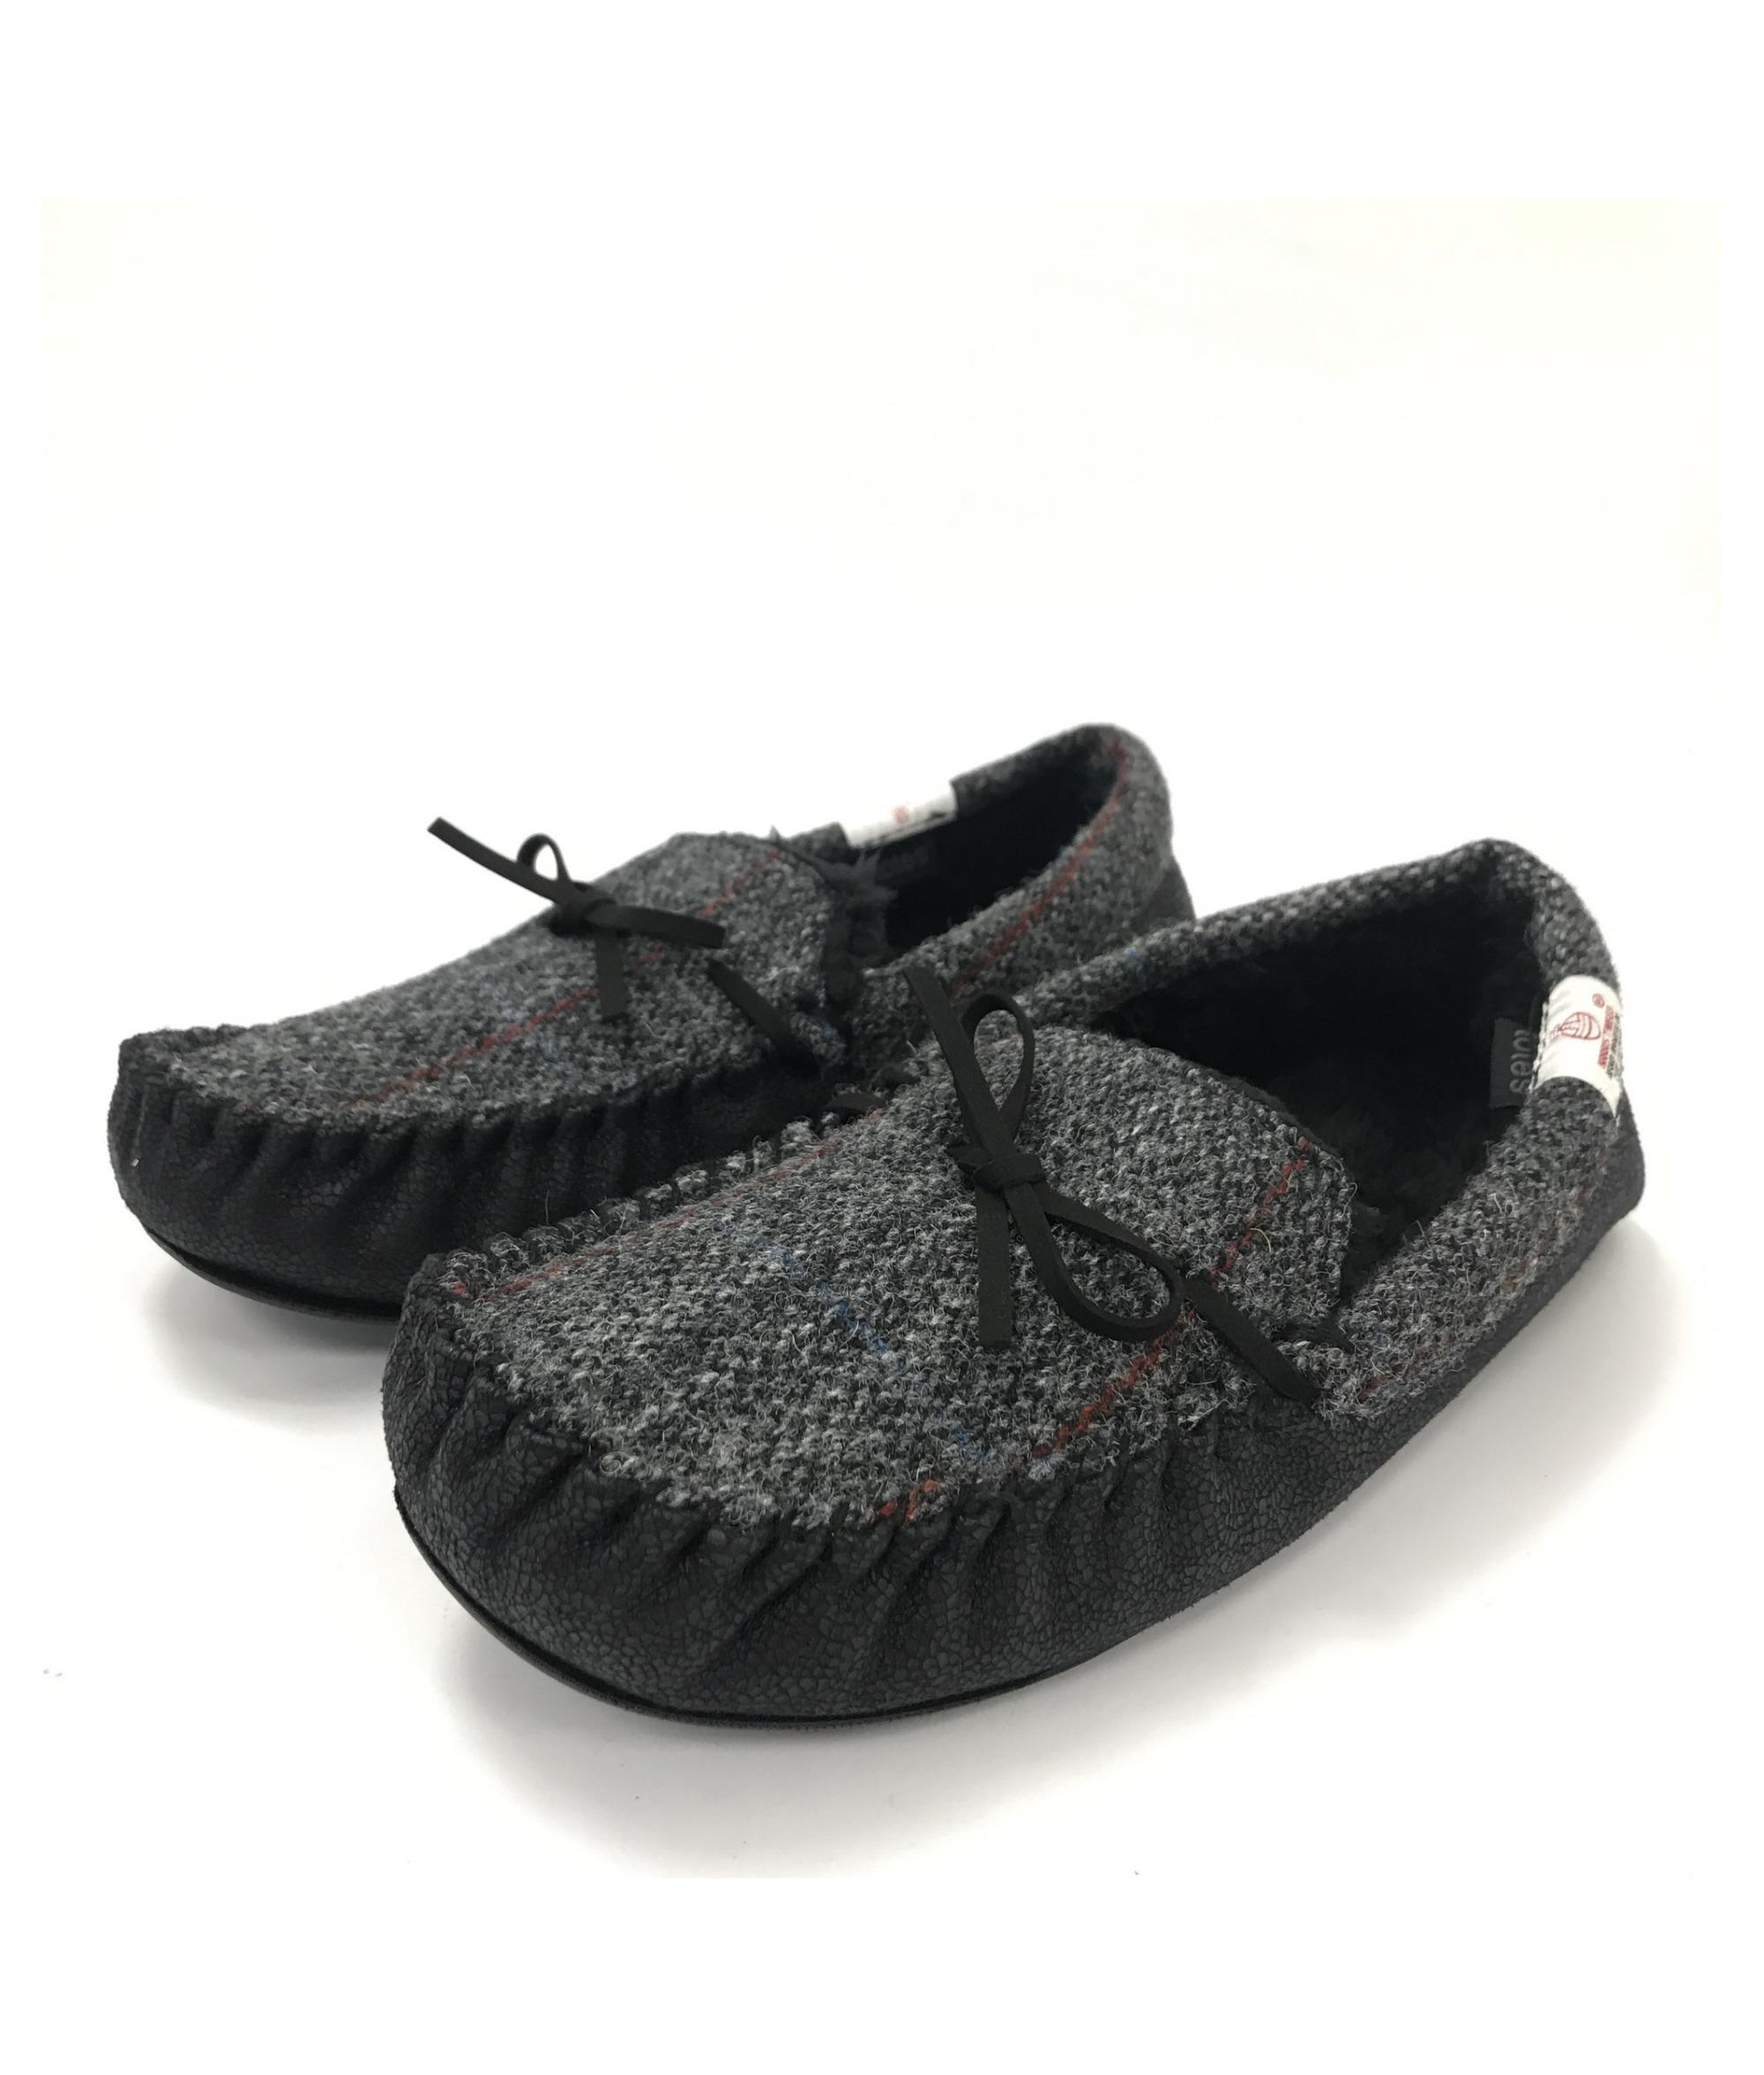 Totes Harris Tweed Moccasin Slippers